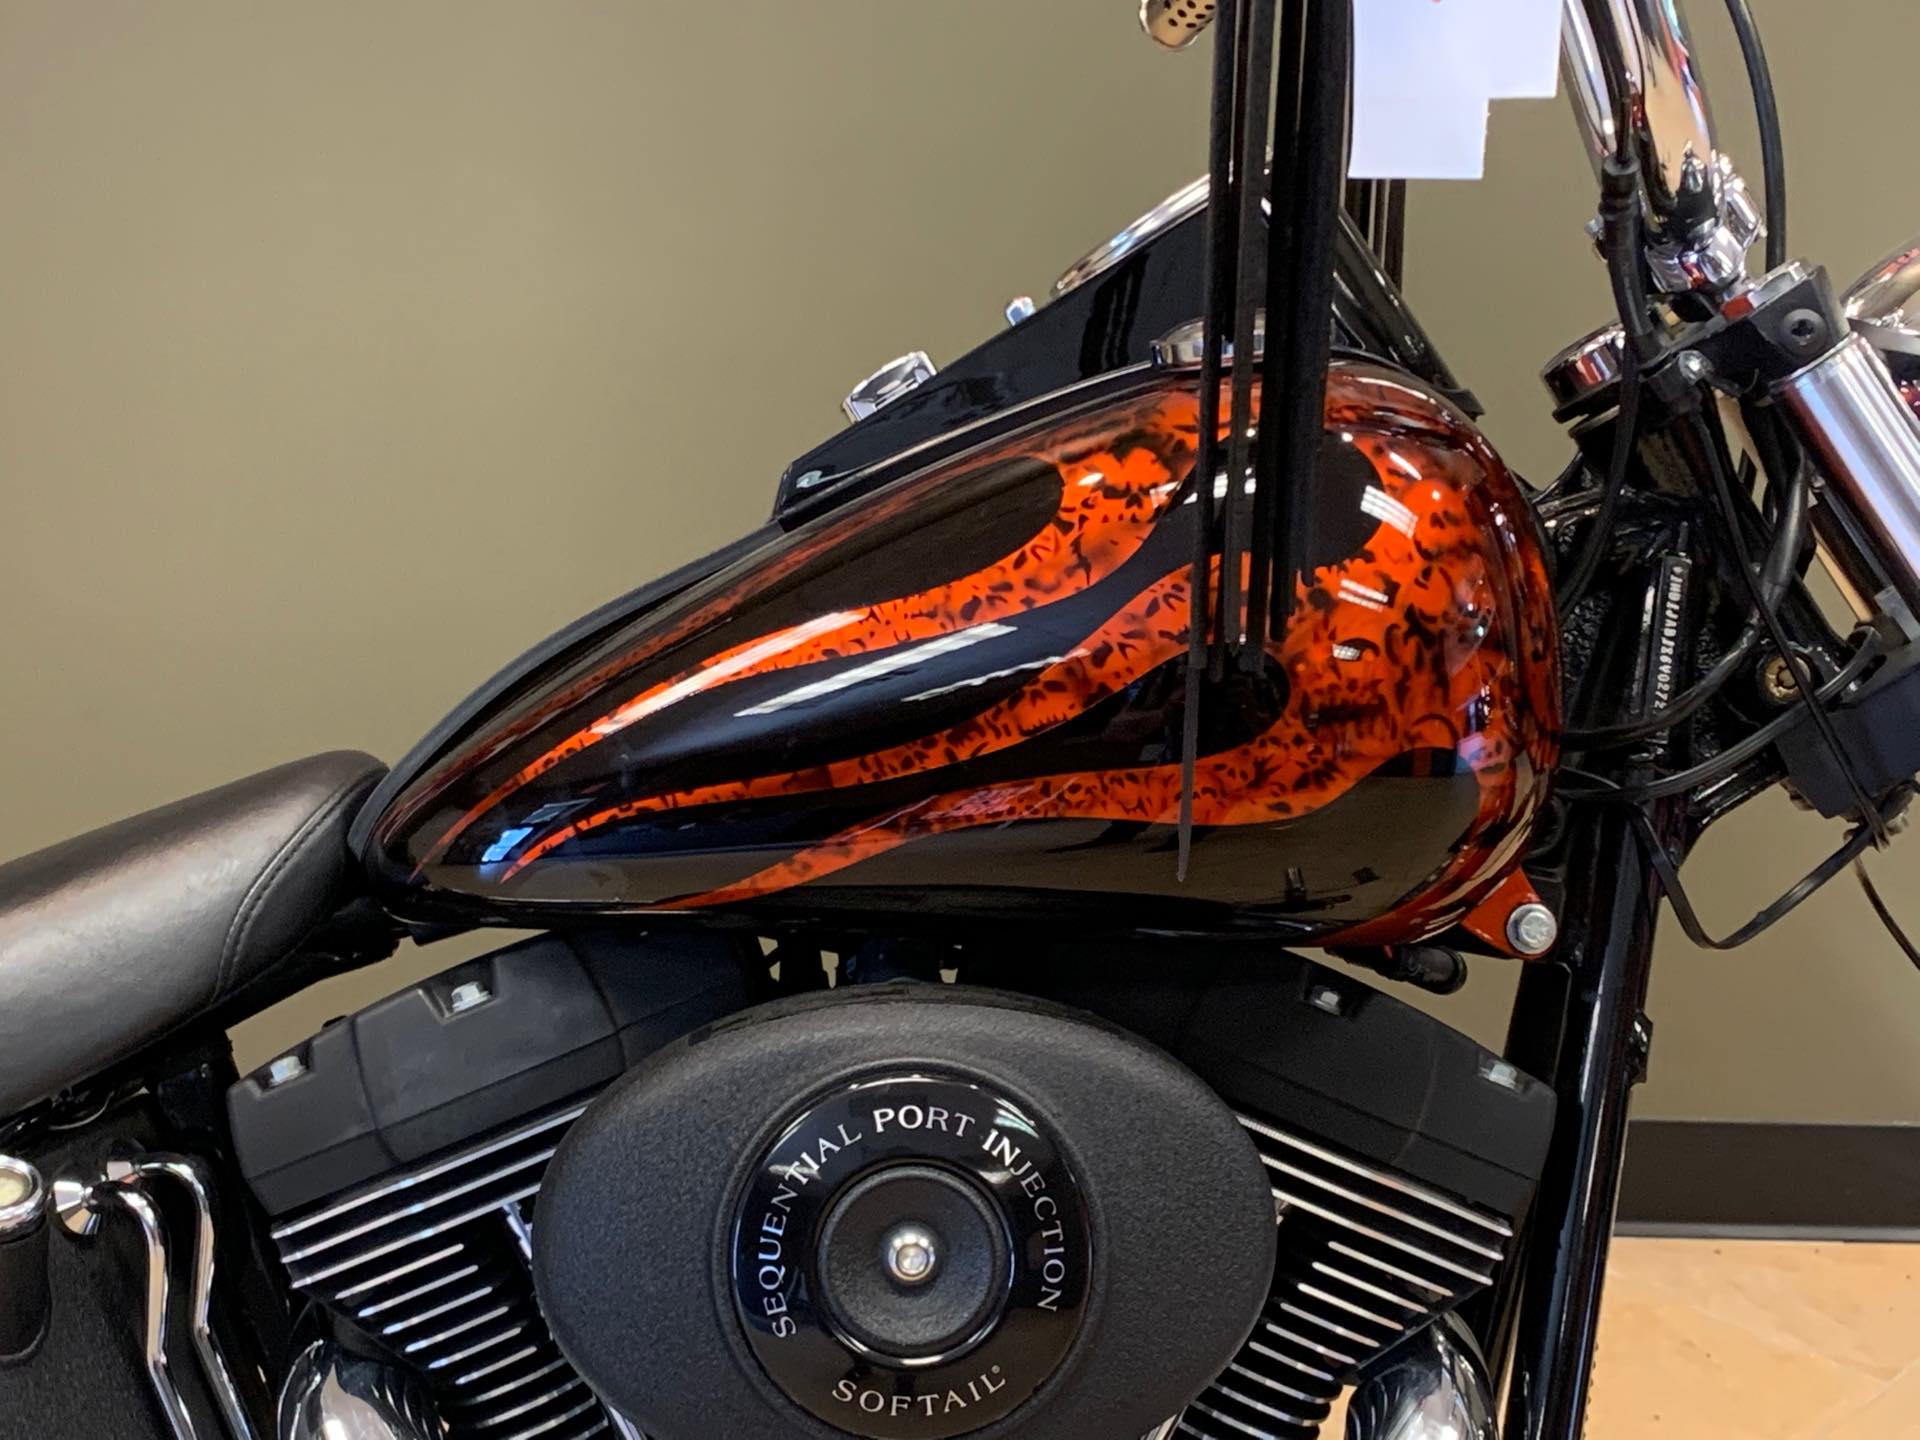 2006 Harley-Davidson Softail Night Train at Loess Hills Harley-Davidson